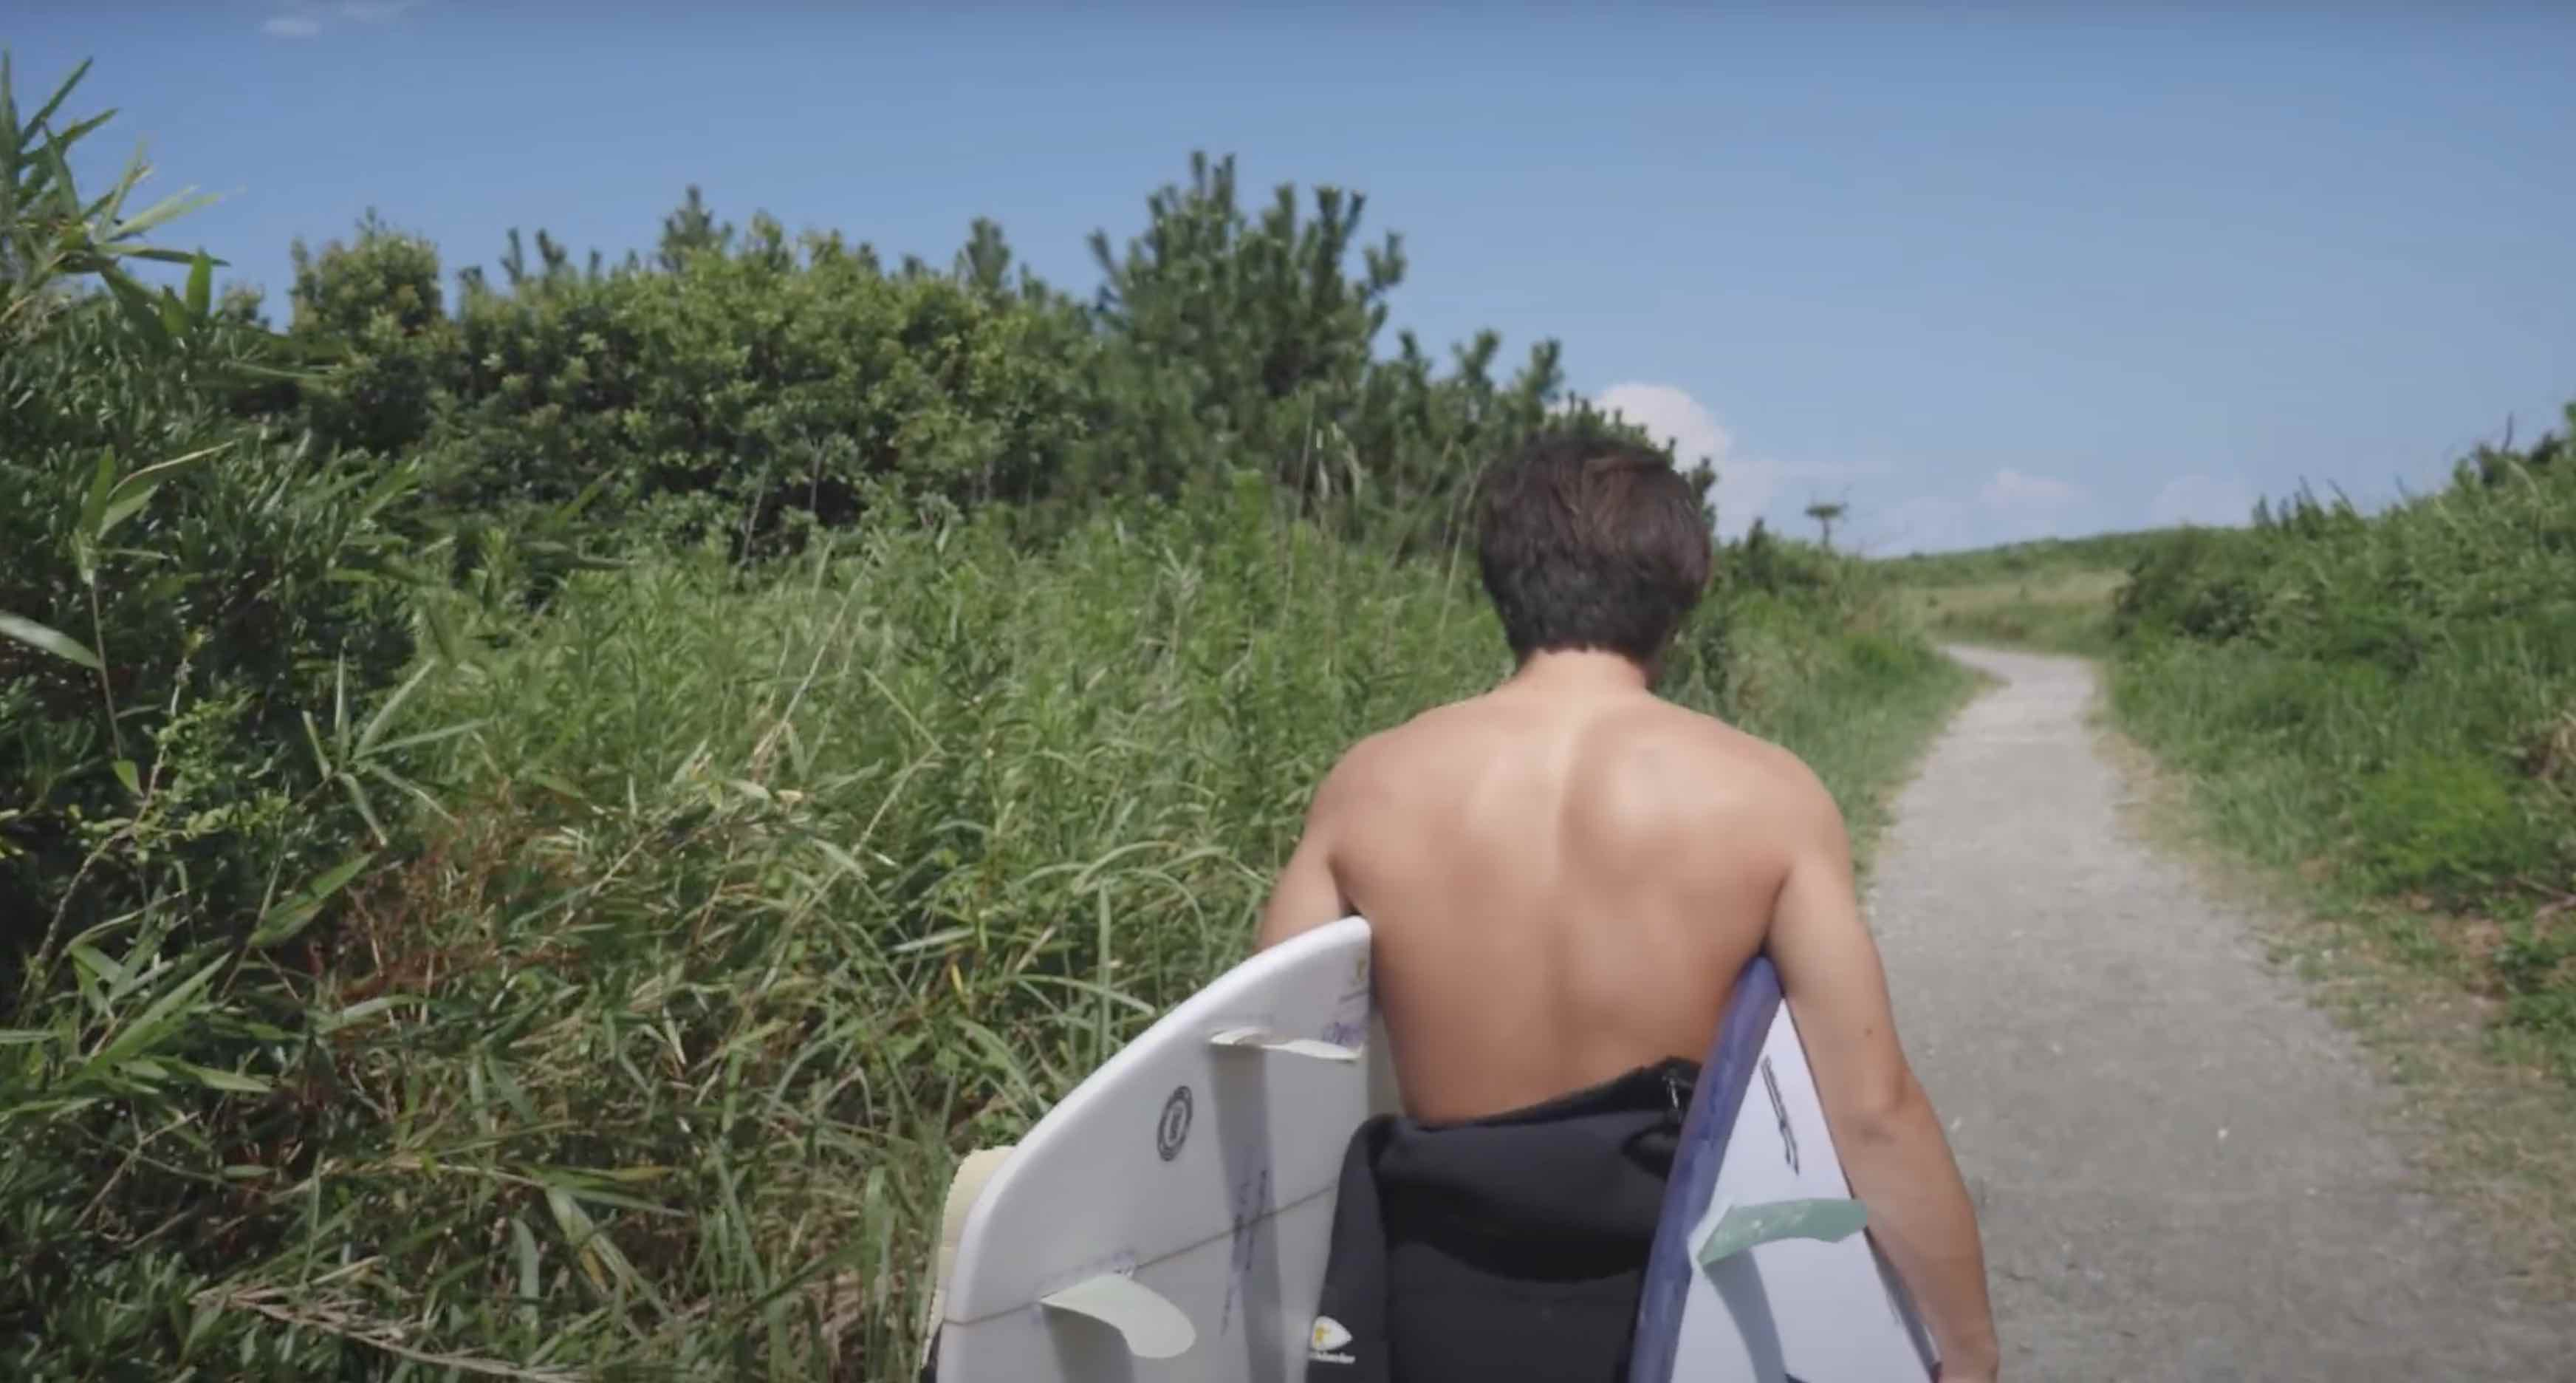 【oceanpeople最新動画】大橋海人、松野陽斗によるサマー・サーフトリップ